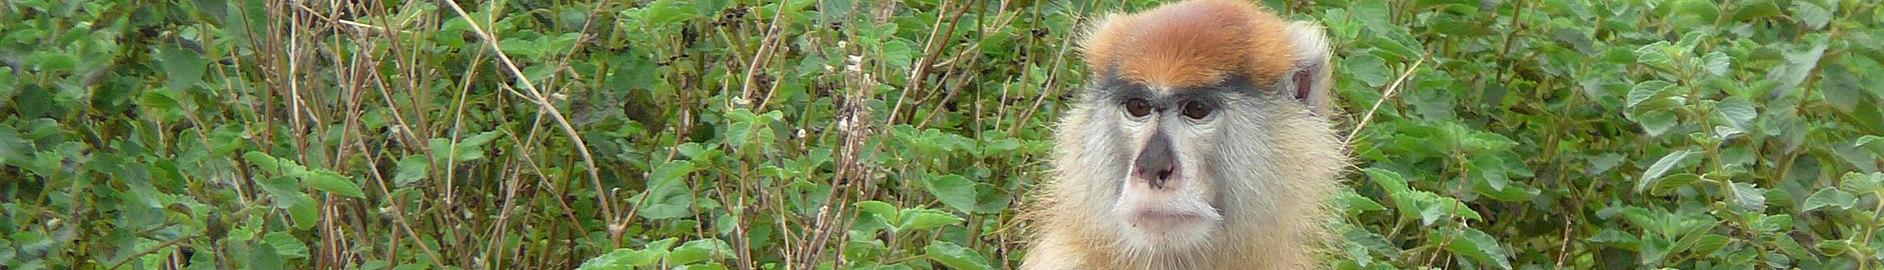 Mole National Park banner Patas Monkey.JPG